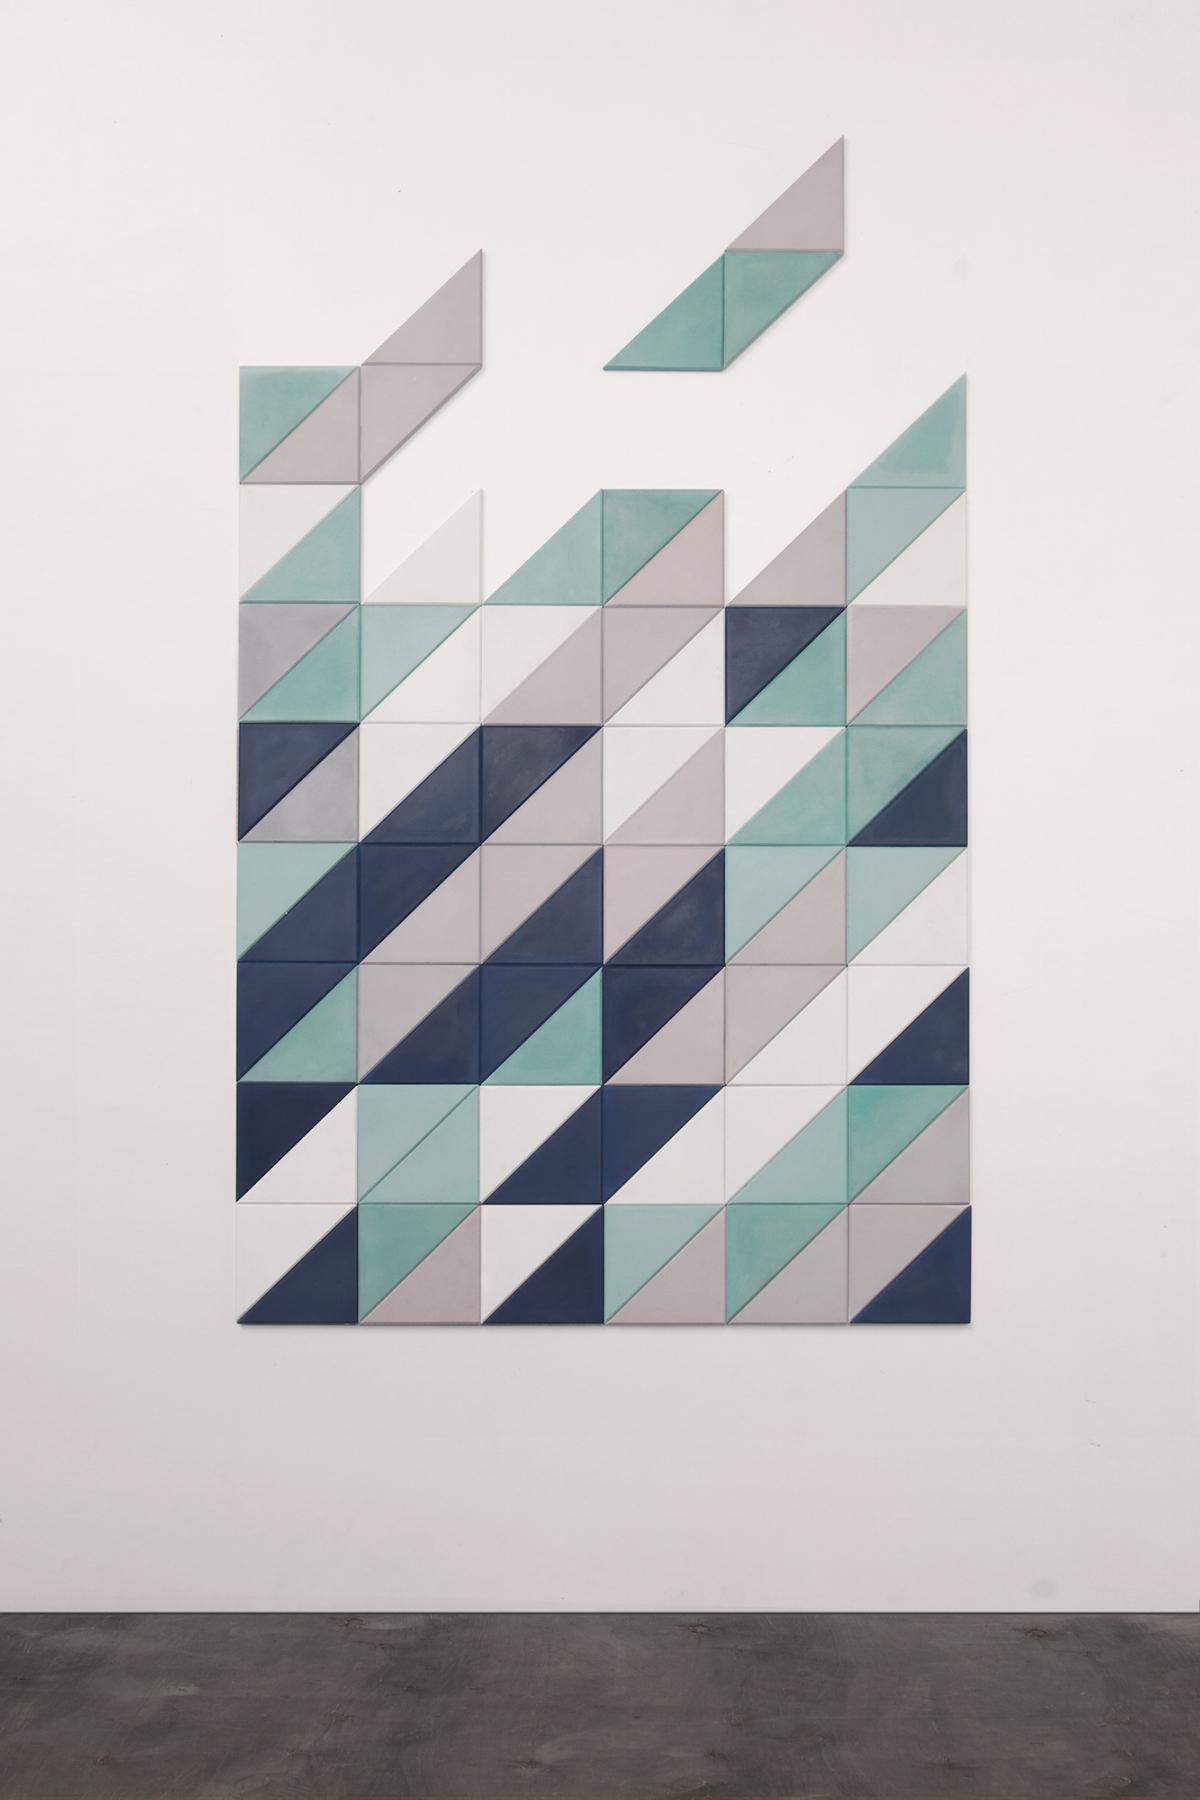 tile concrete wood LOFT minimalist fild design wall FLOOR triangle delata color mint pink grey